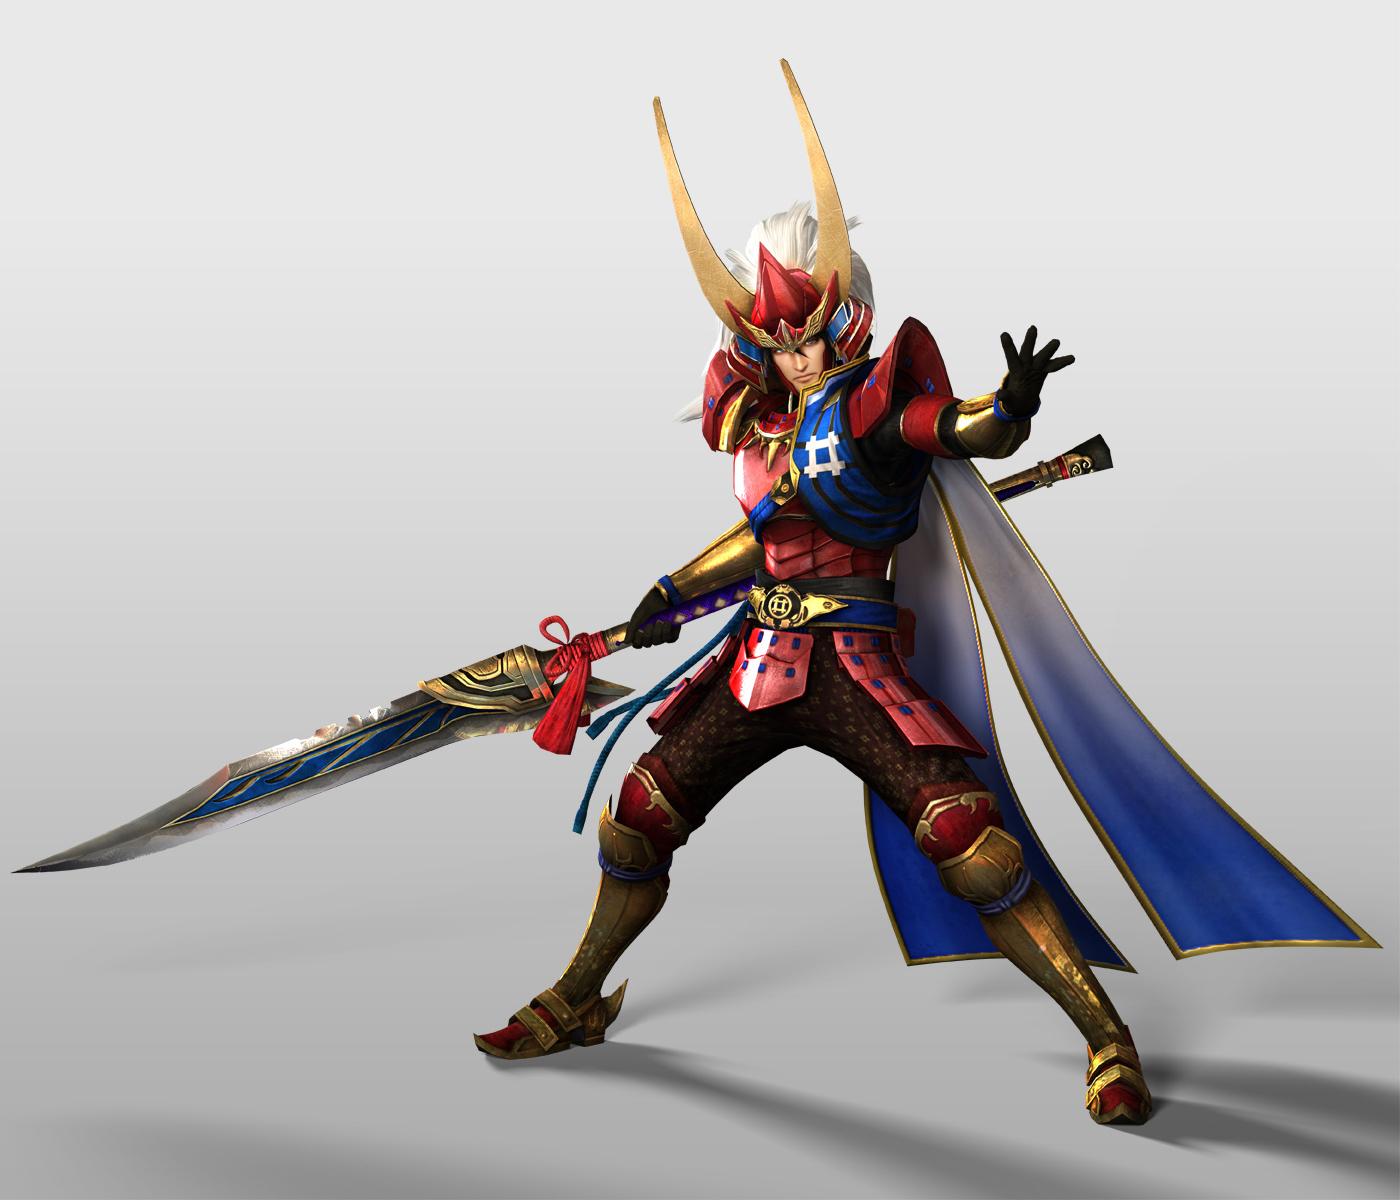 Warriors Orochi 3 Ultimate Guan Yu Mystic Weapon: Fandom Powered By Wikia